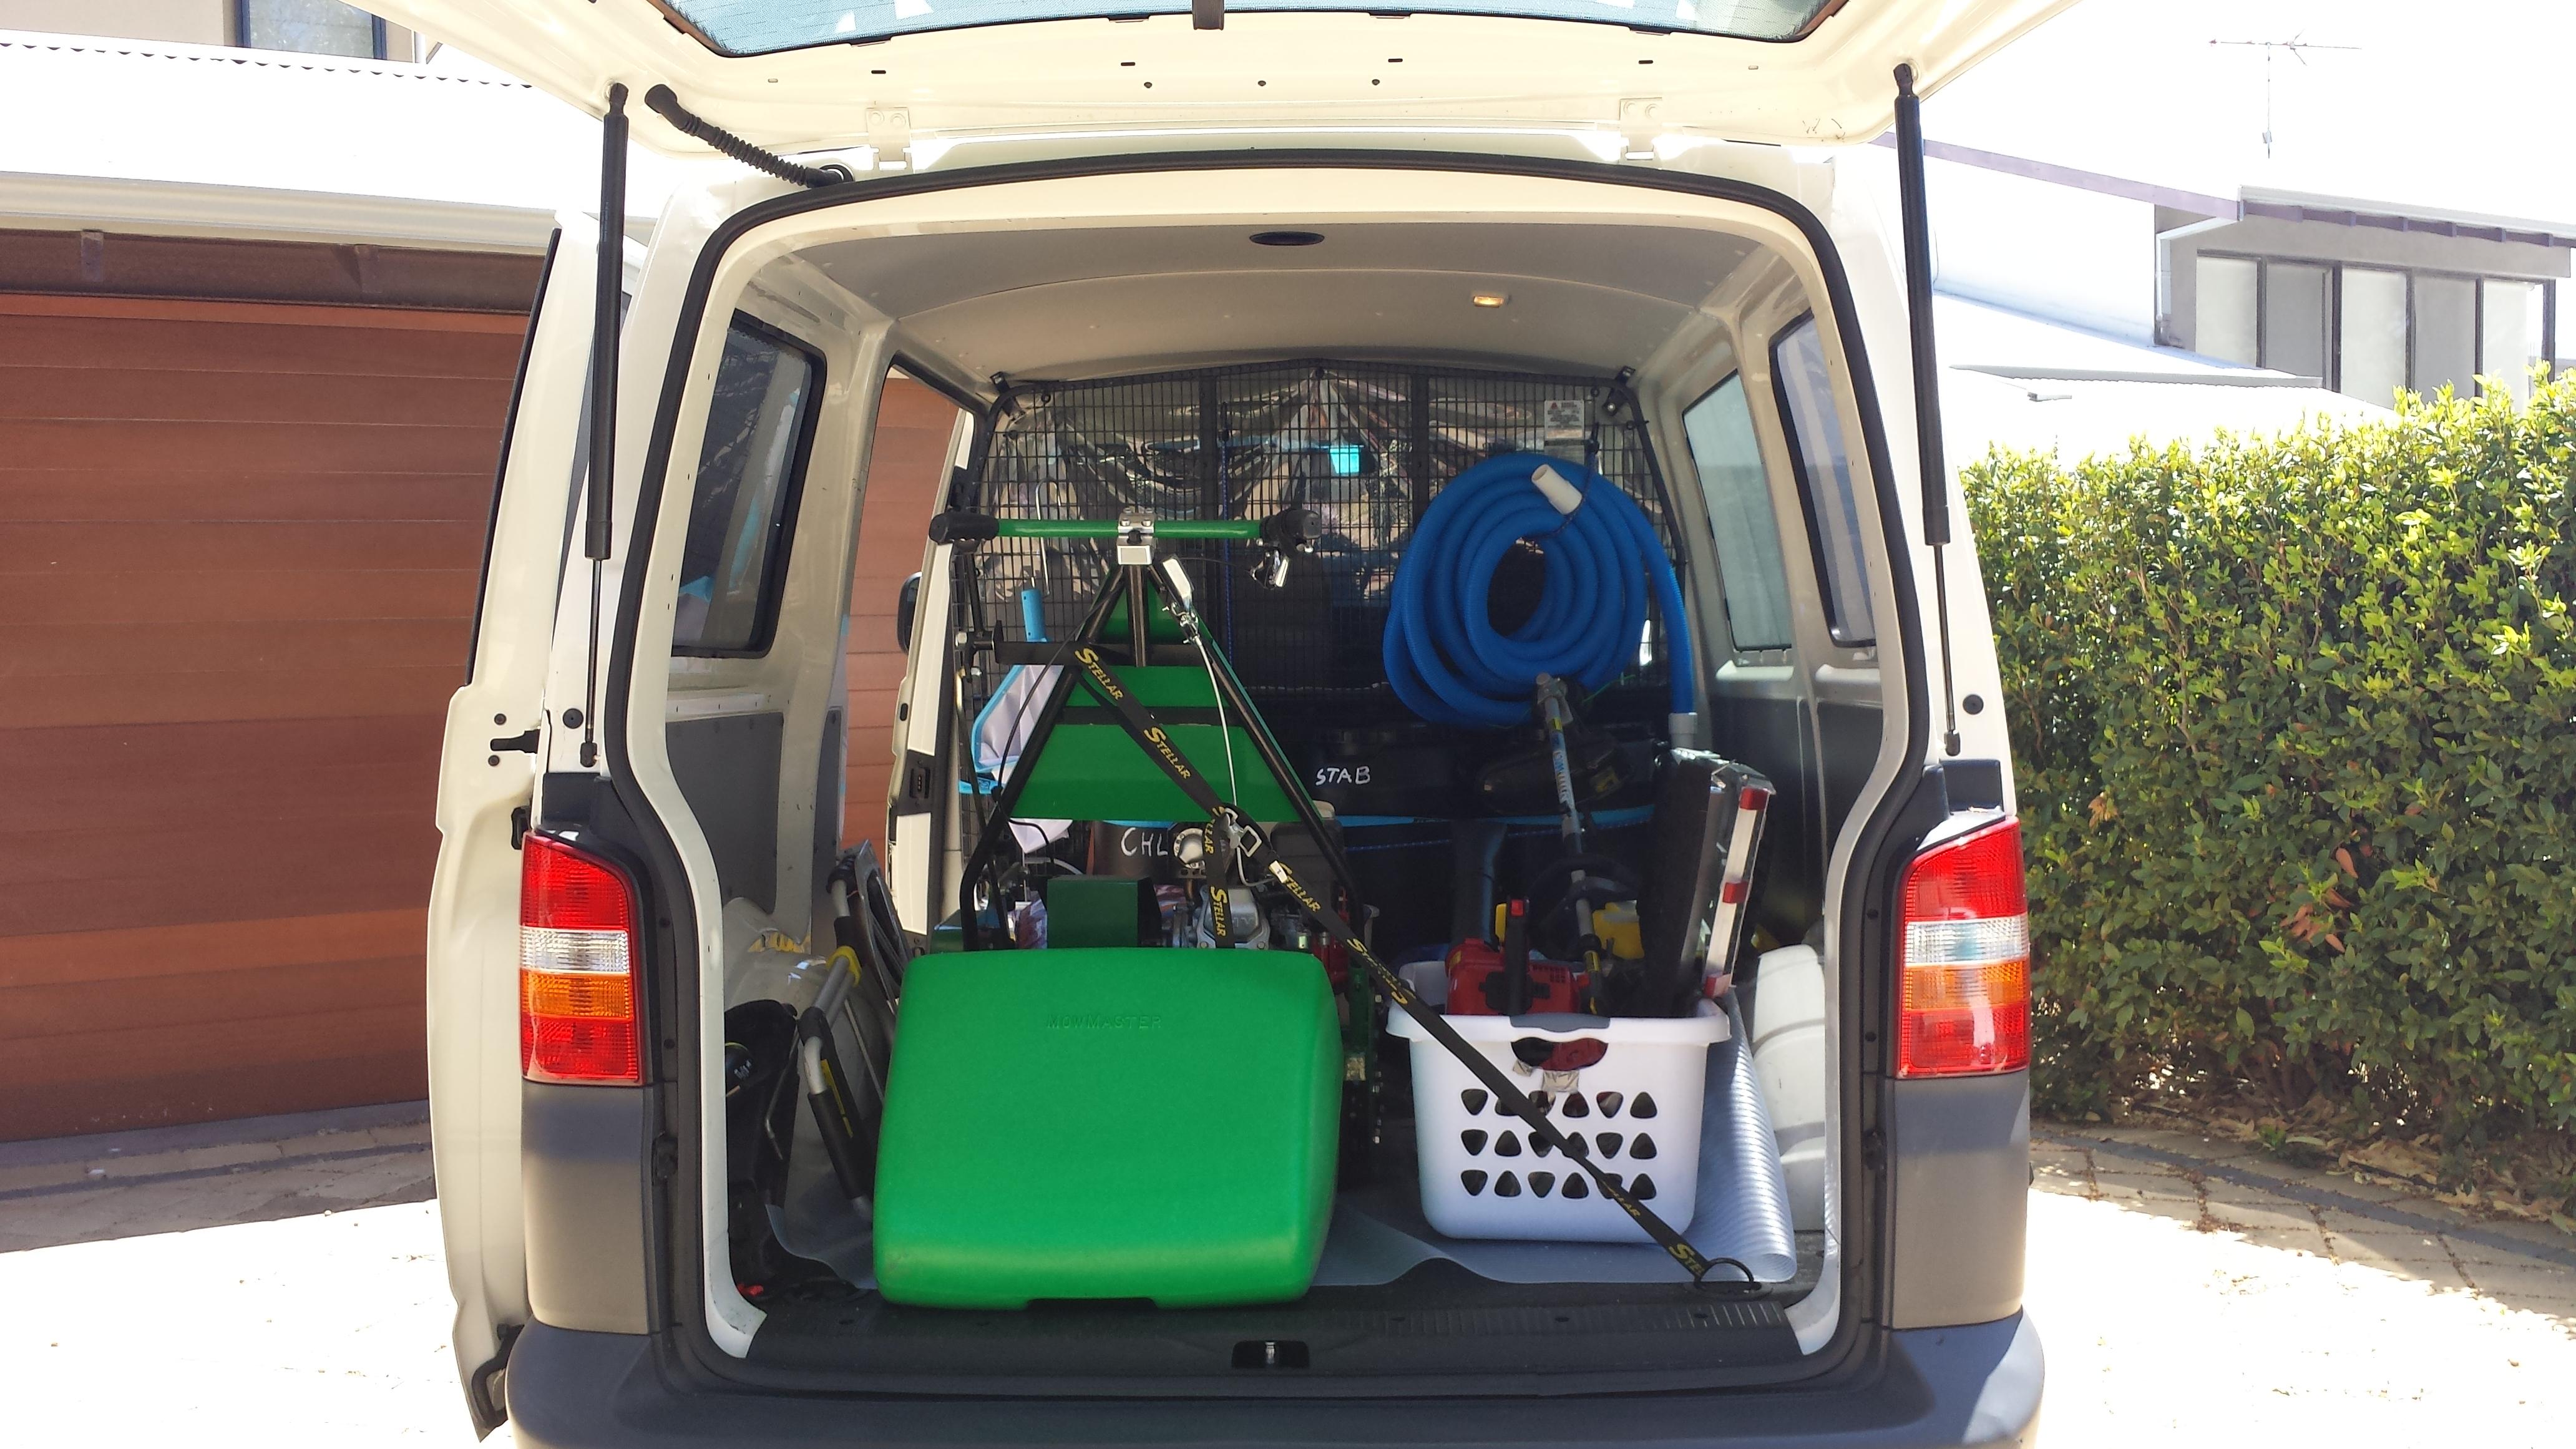 Pool and garden maintenance services services parden for Garden maintenance van